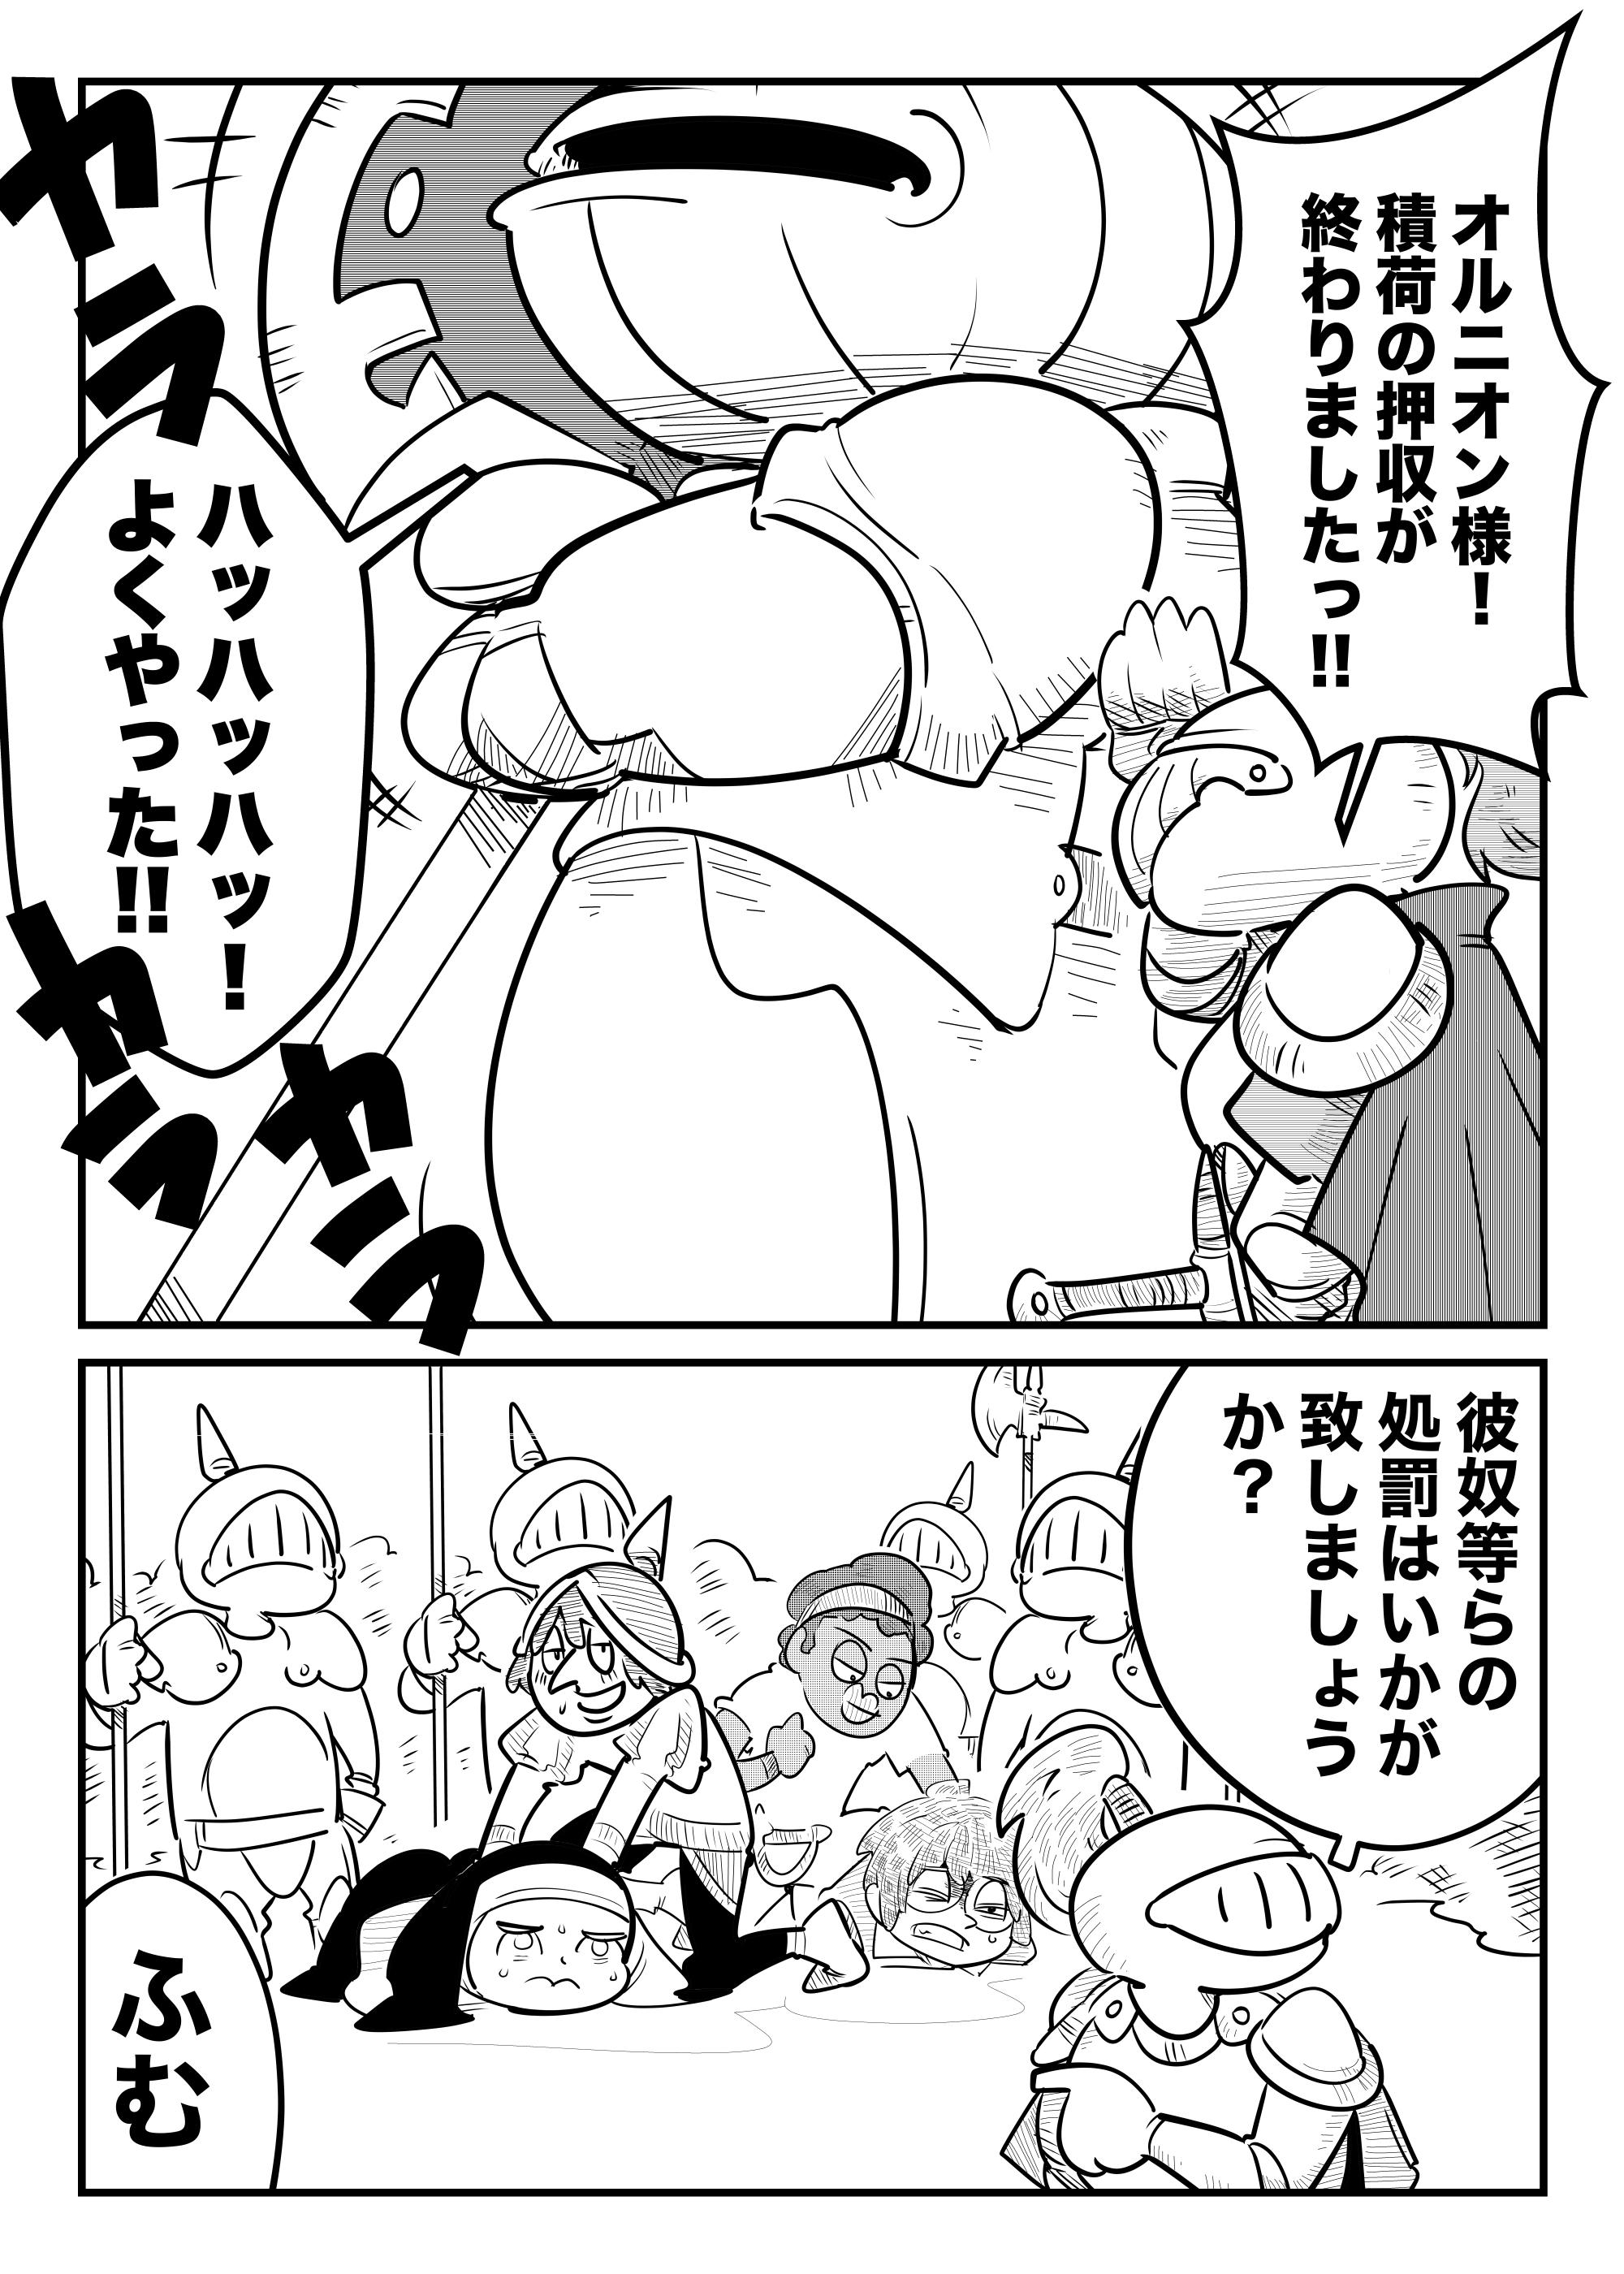 f:id:terashimaru117:20210914183100p:plain